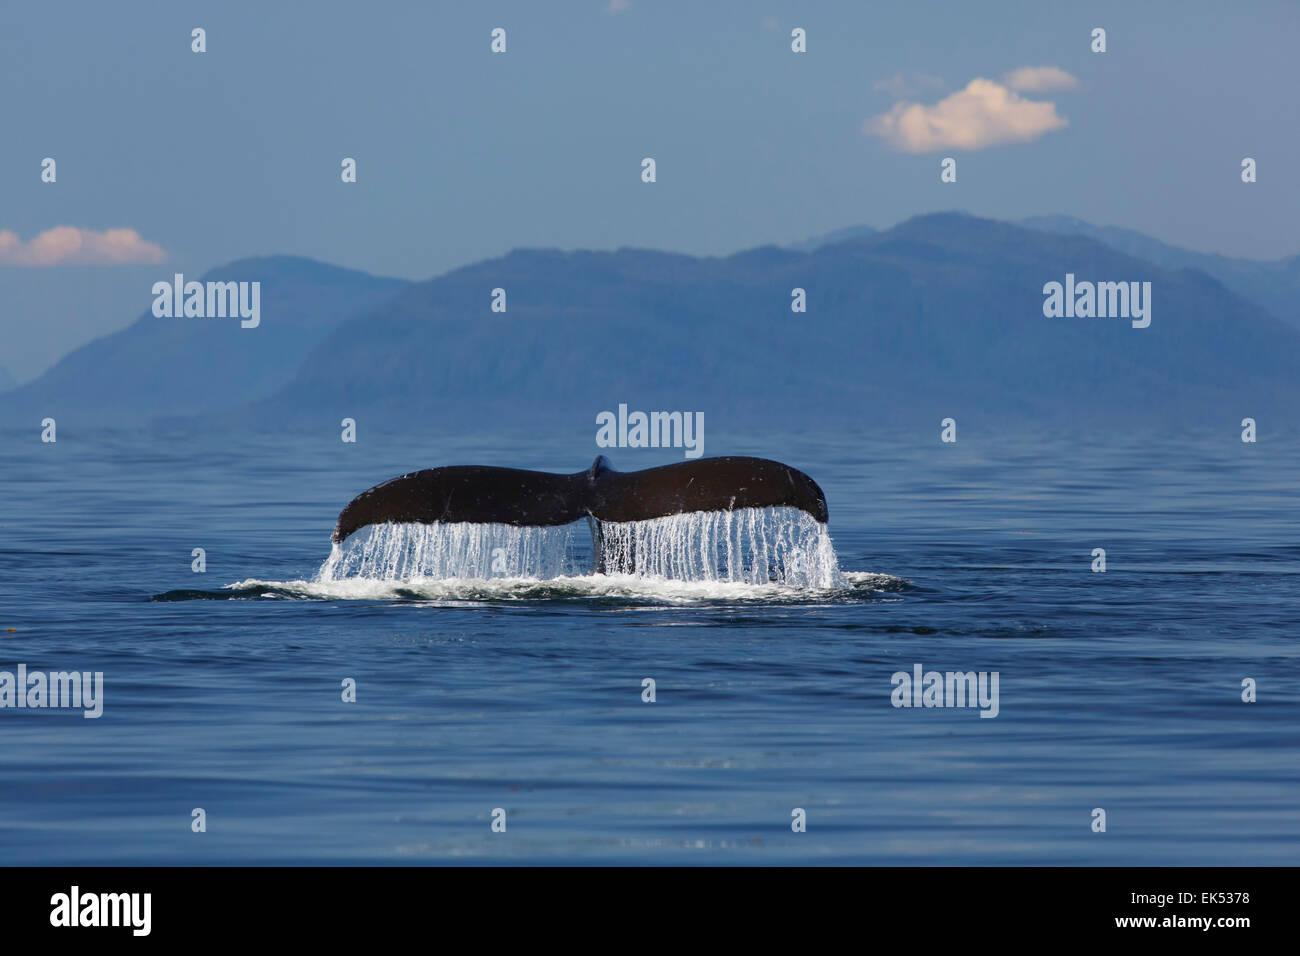 La ballena jorobada, Frederick Sound, Tongass National Forest, Alaska. Imagen De Stock